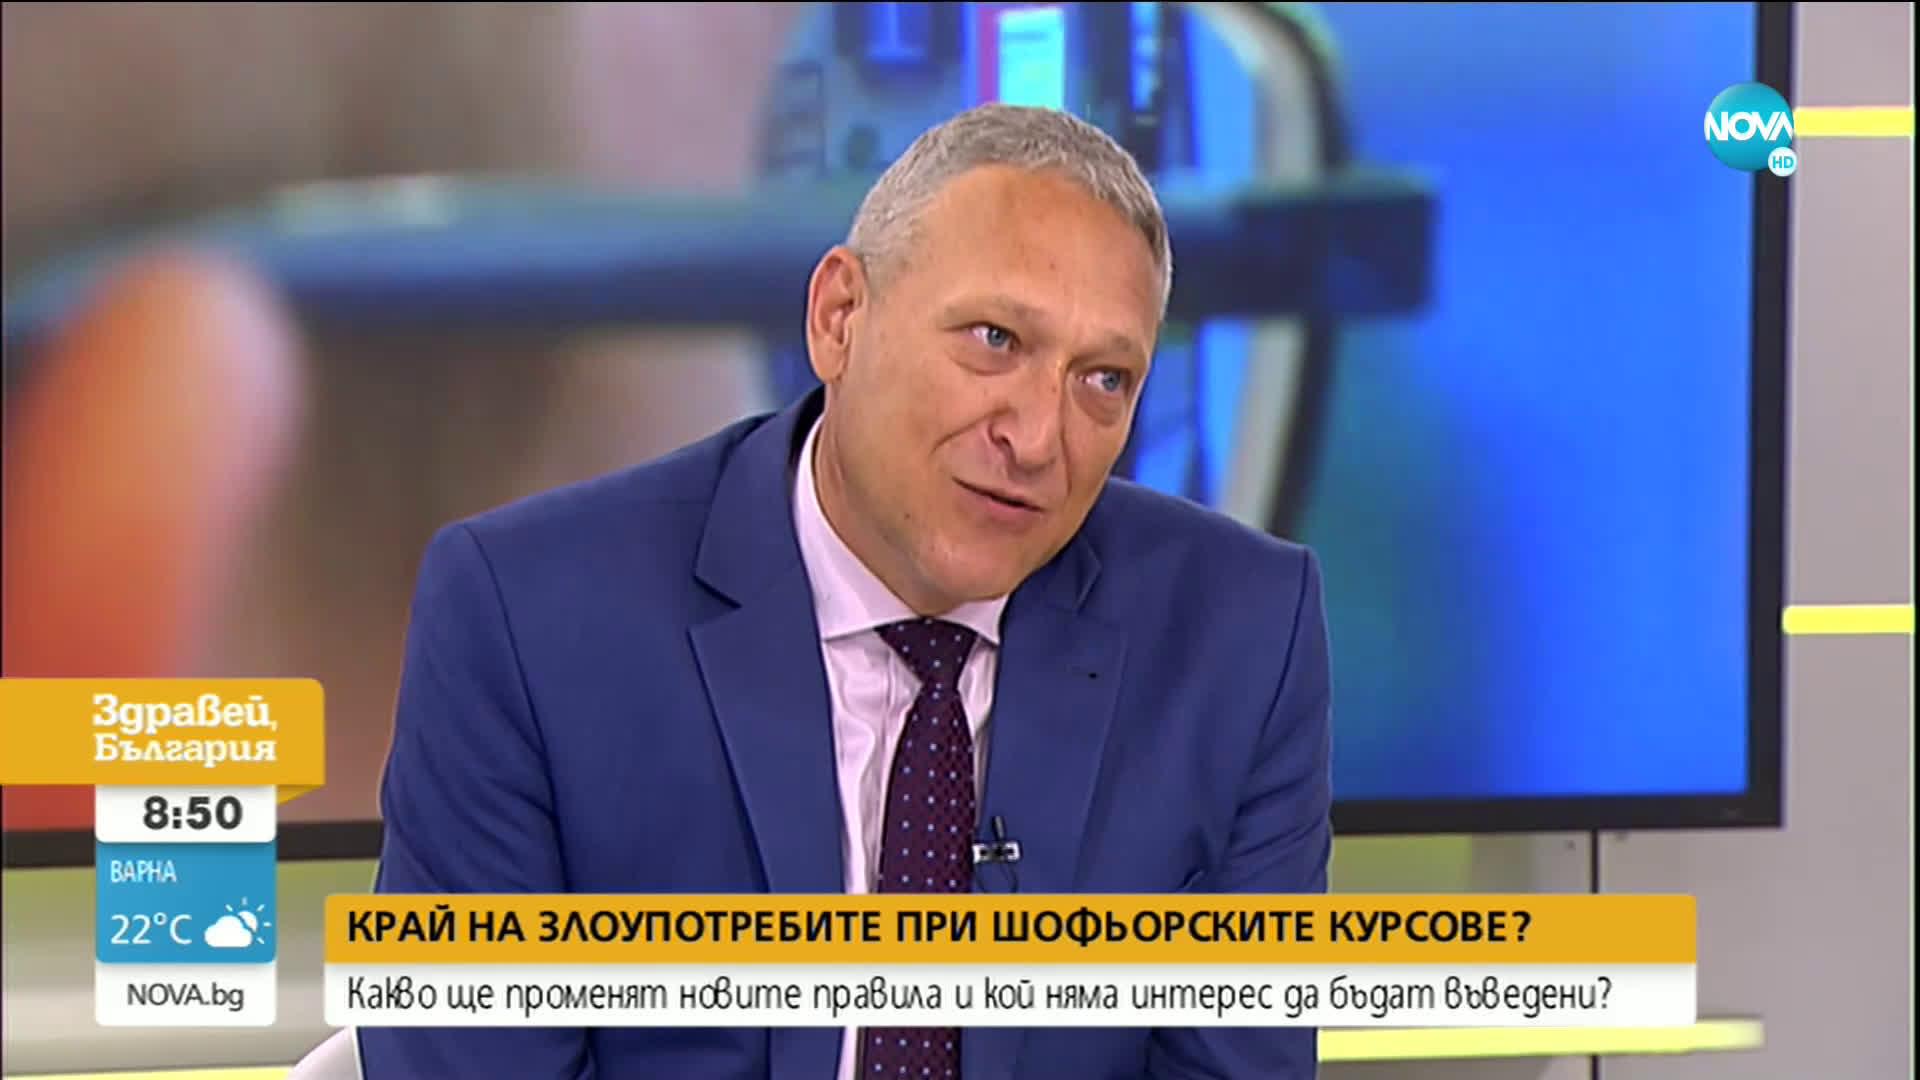 Бойко Рановски: При проверки на автошколите се натъкваме на редица злоупотреби